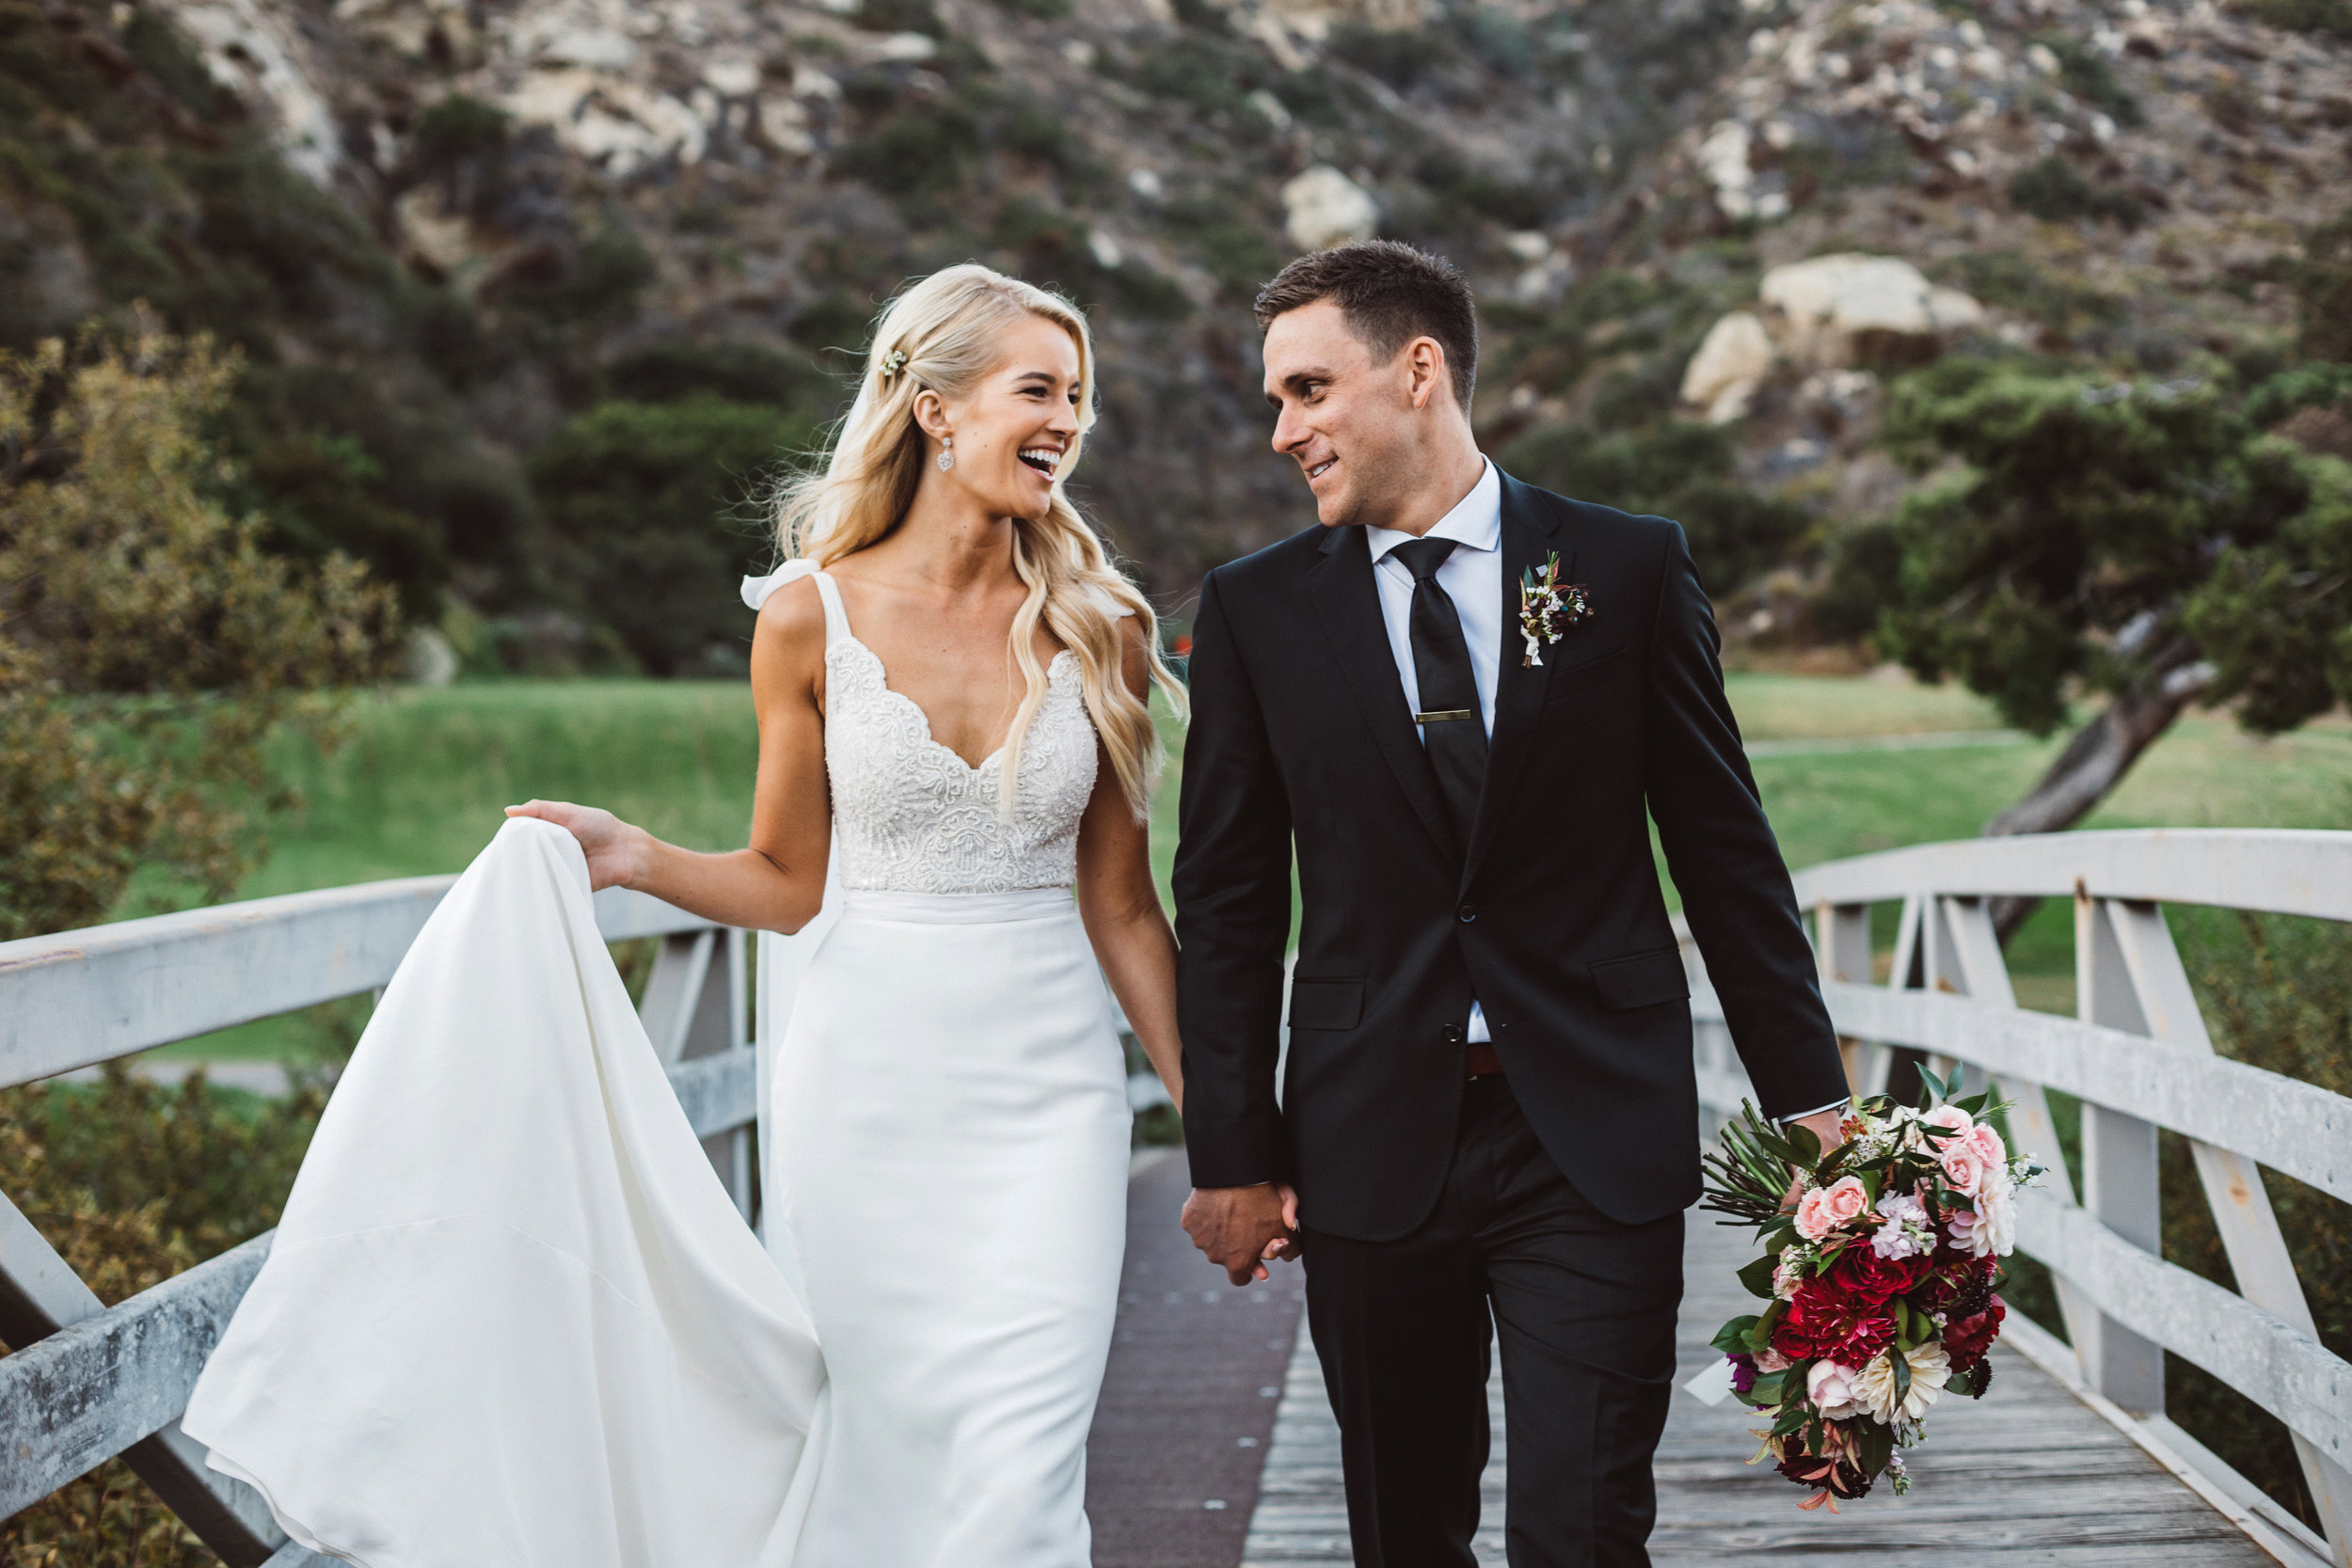 Erica + Mikey Wedding   The Ranch in Laguna Beach, CA.